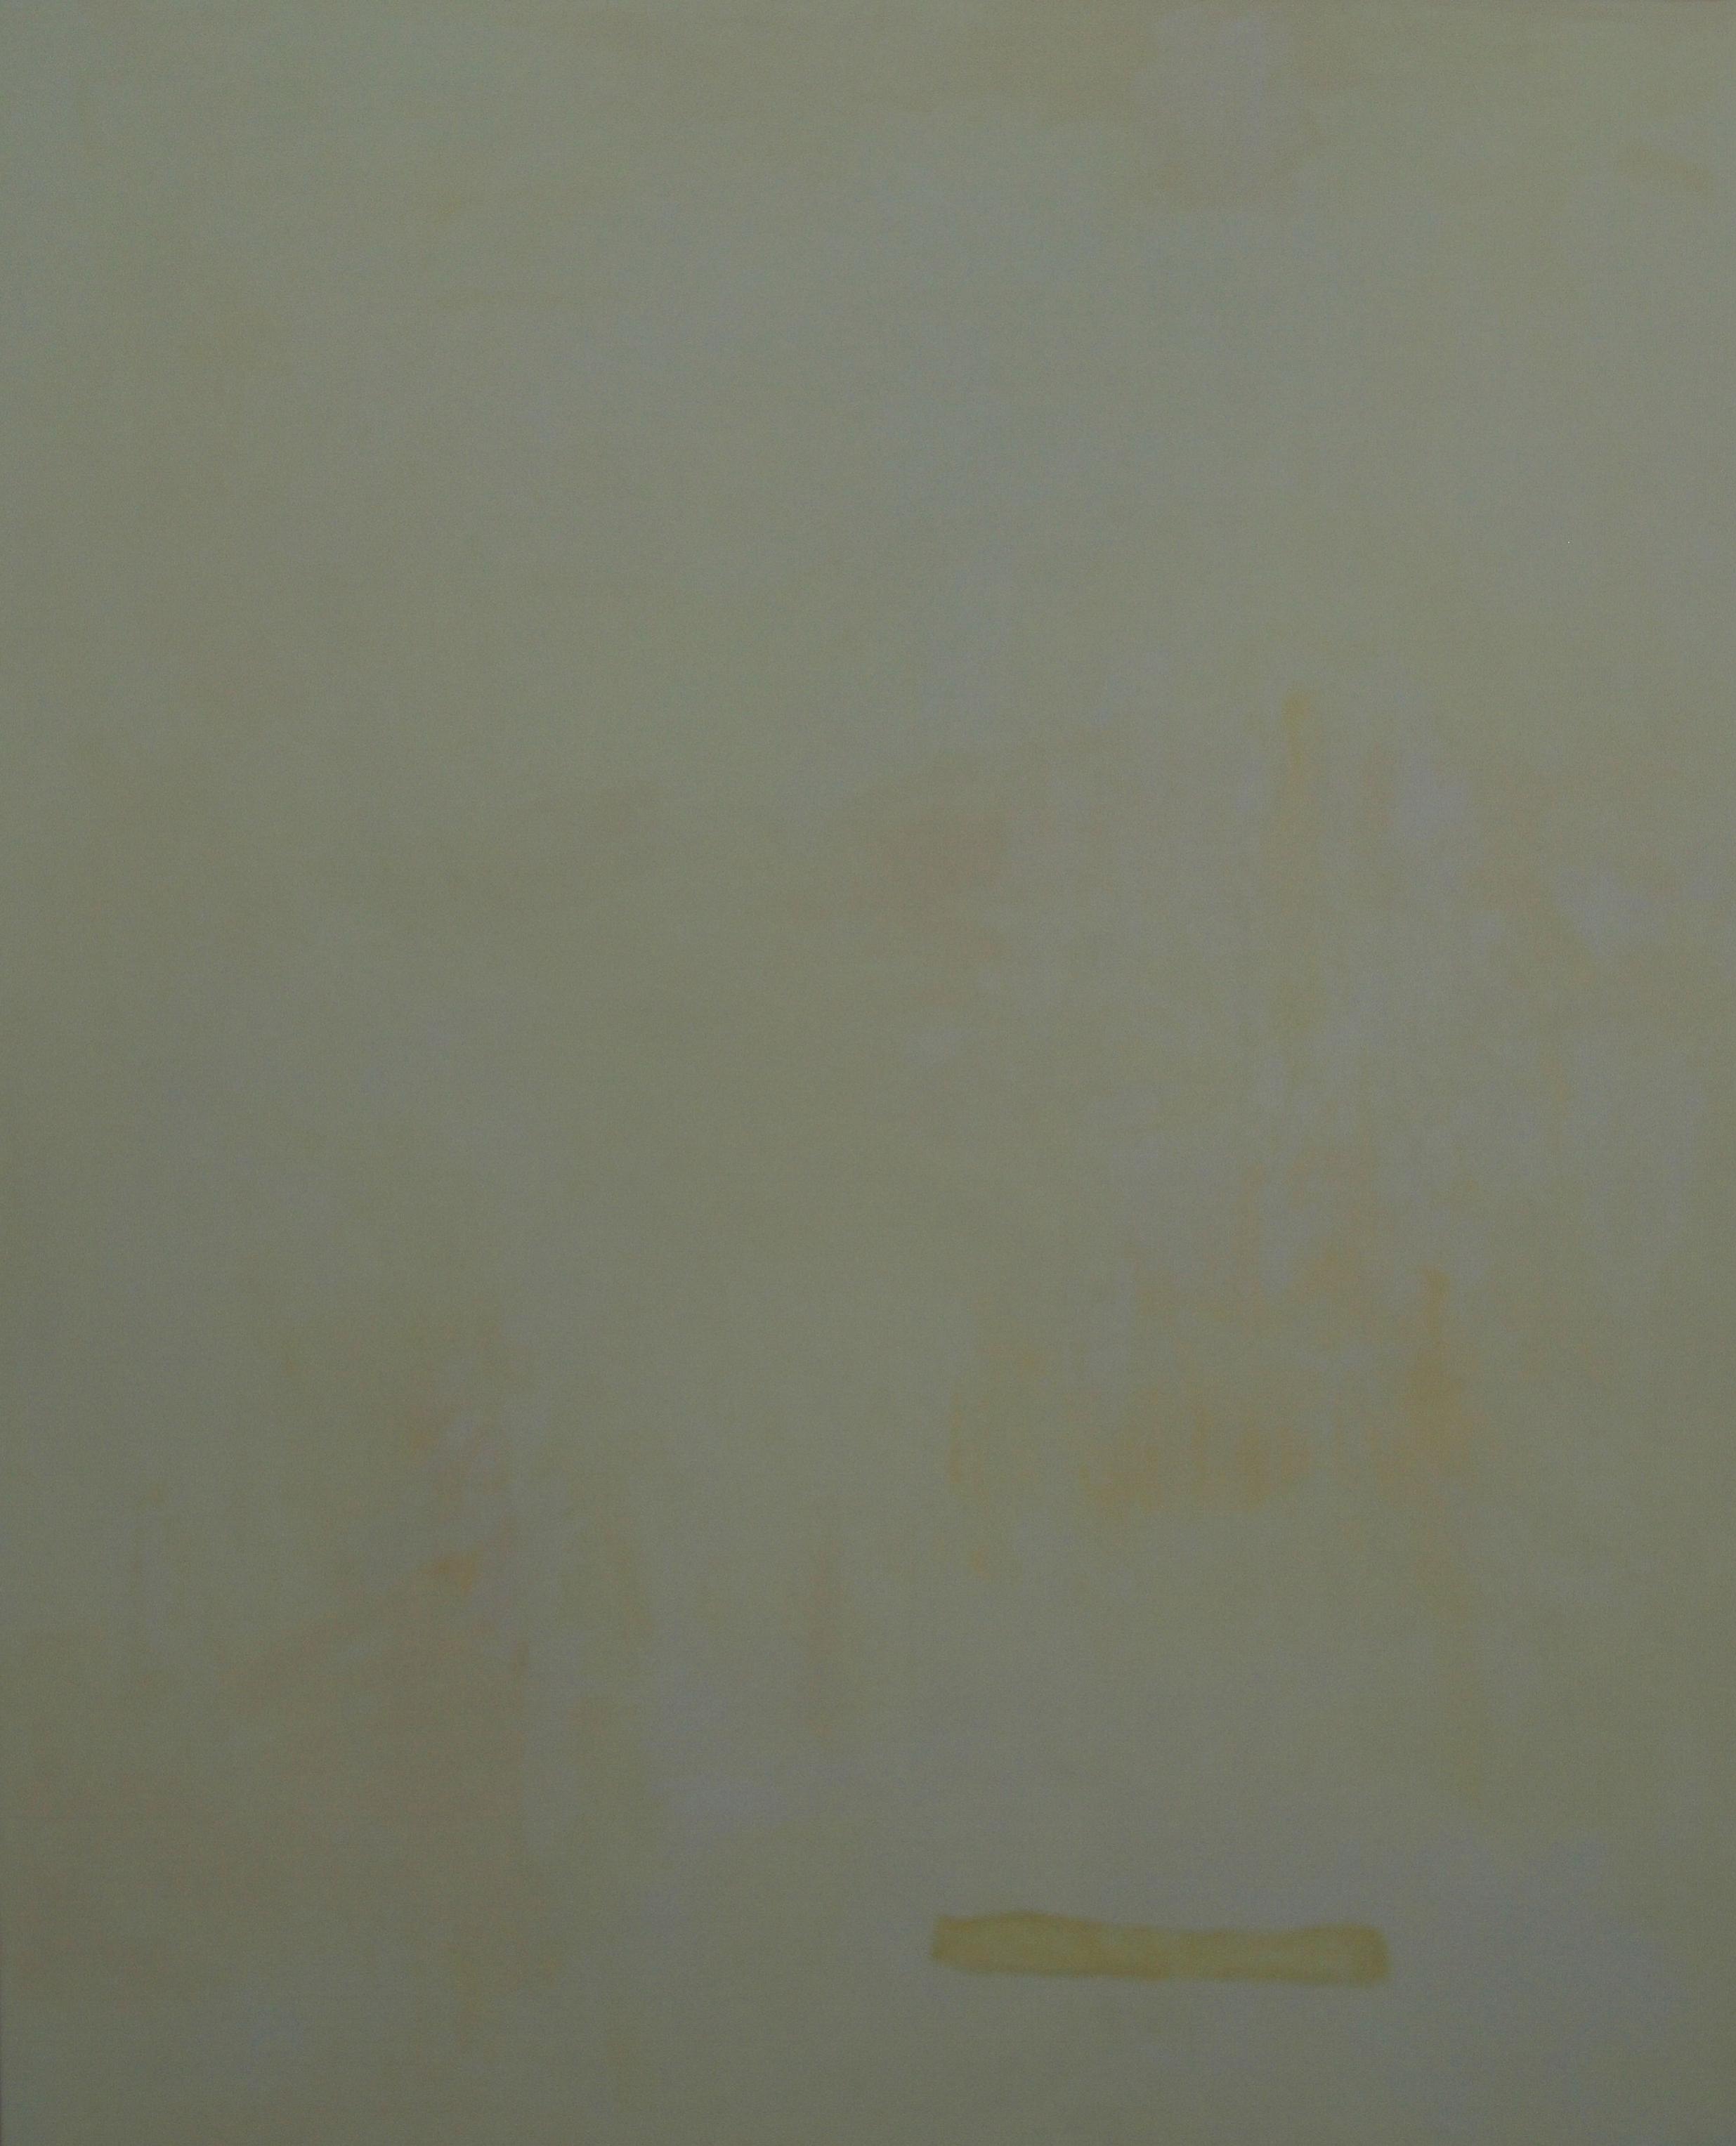 "Please Be Quiet Please, 2012, 60"" x 48"", oil on linen"